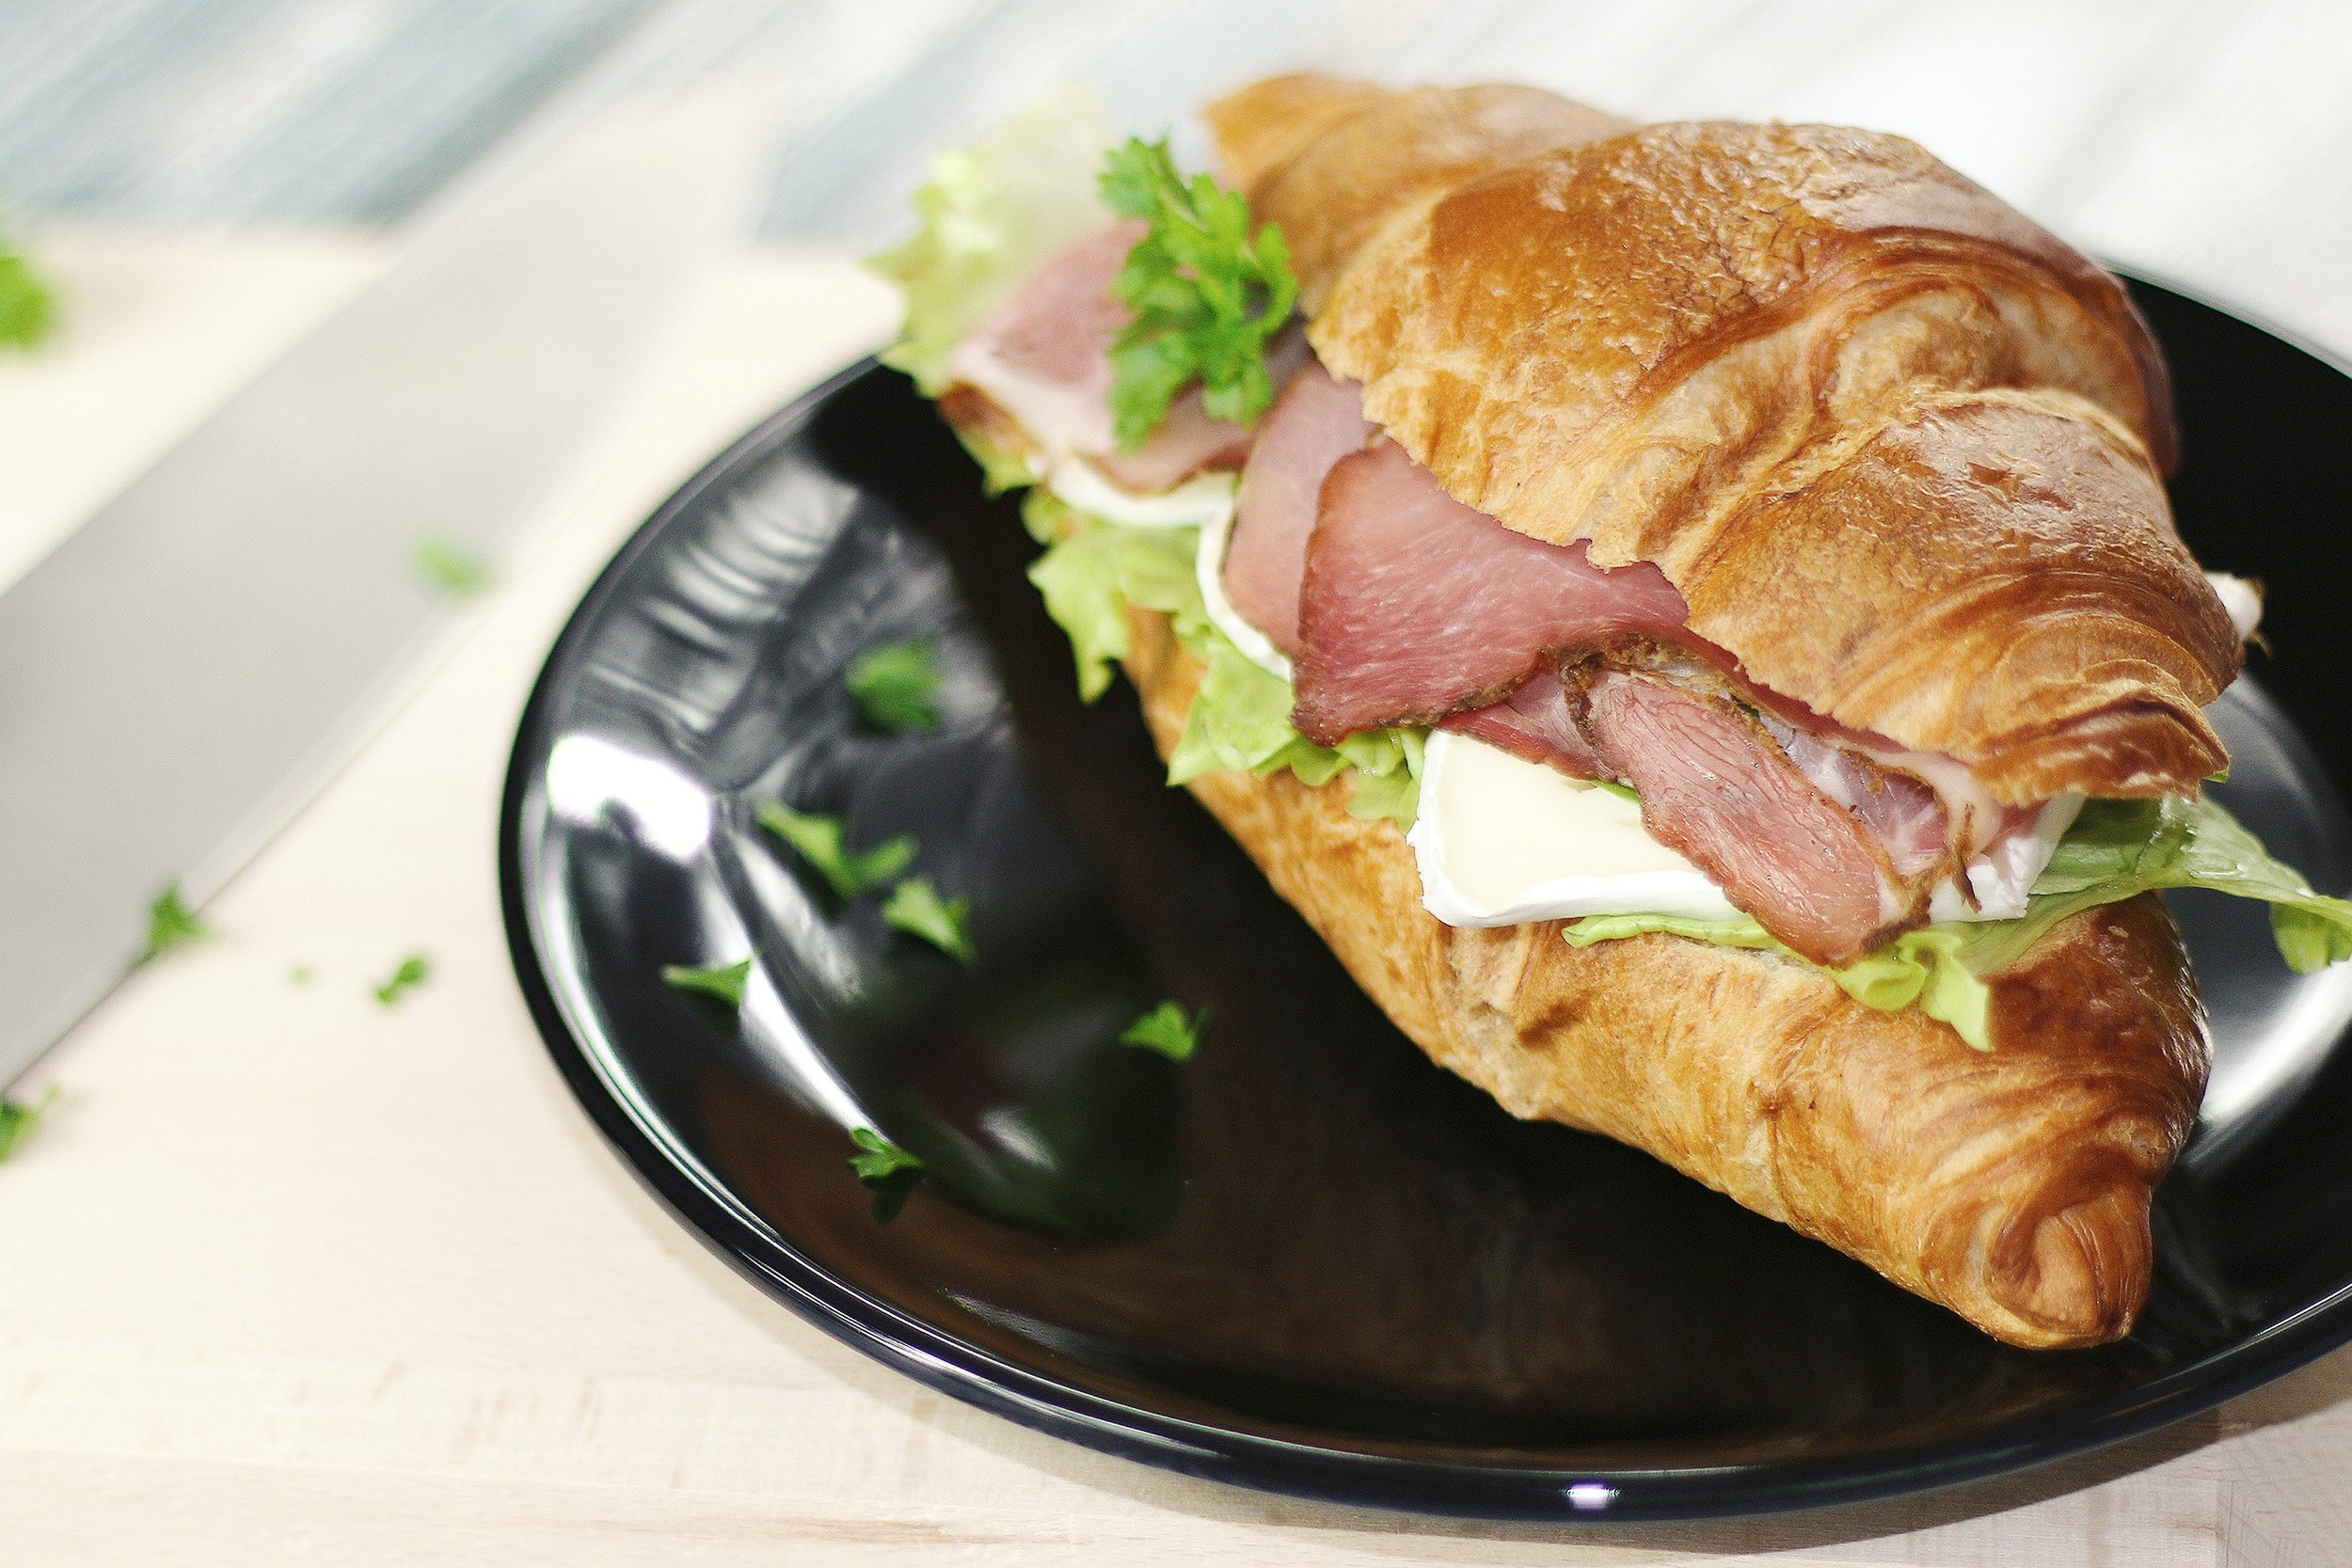 bakery-croissant-delicious-7390.jpg